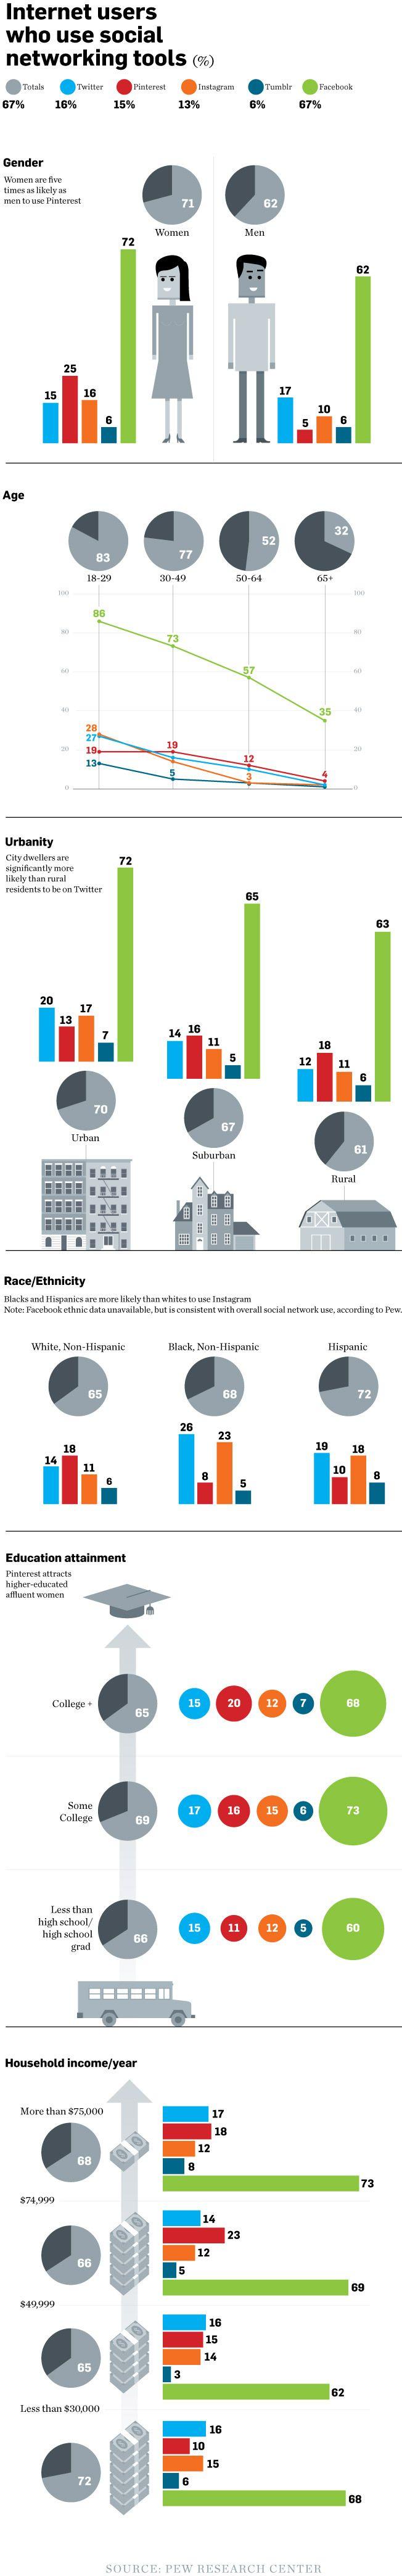 Social Media 2013: User Demographics For Facebook, Twitter, Pinterest And Instagram